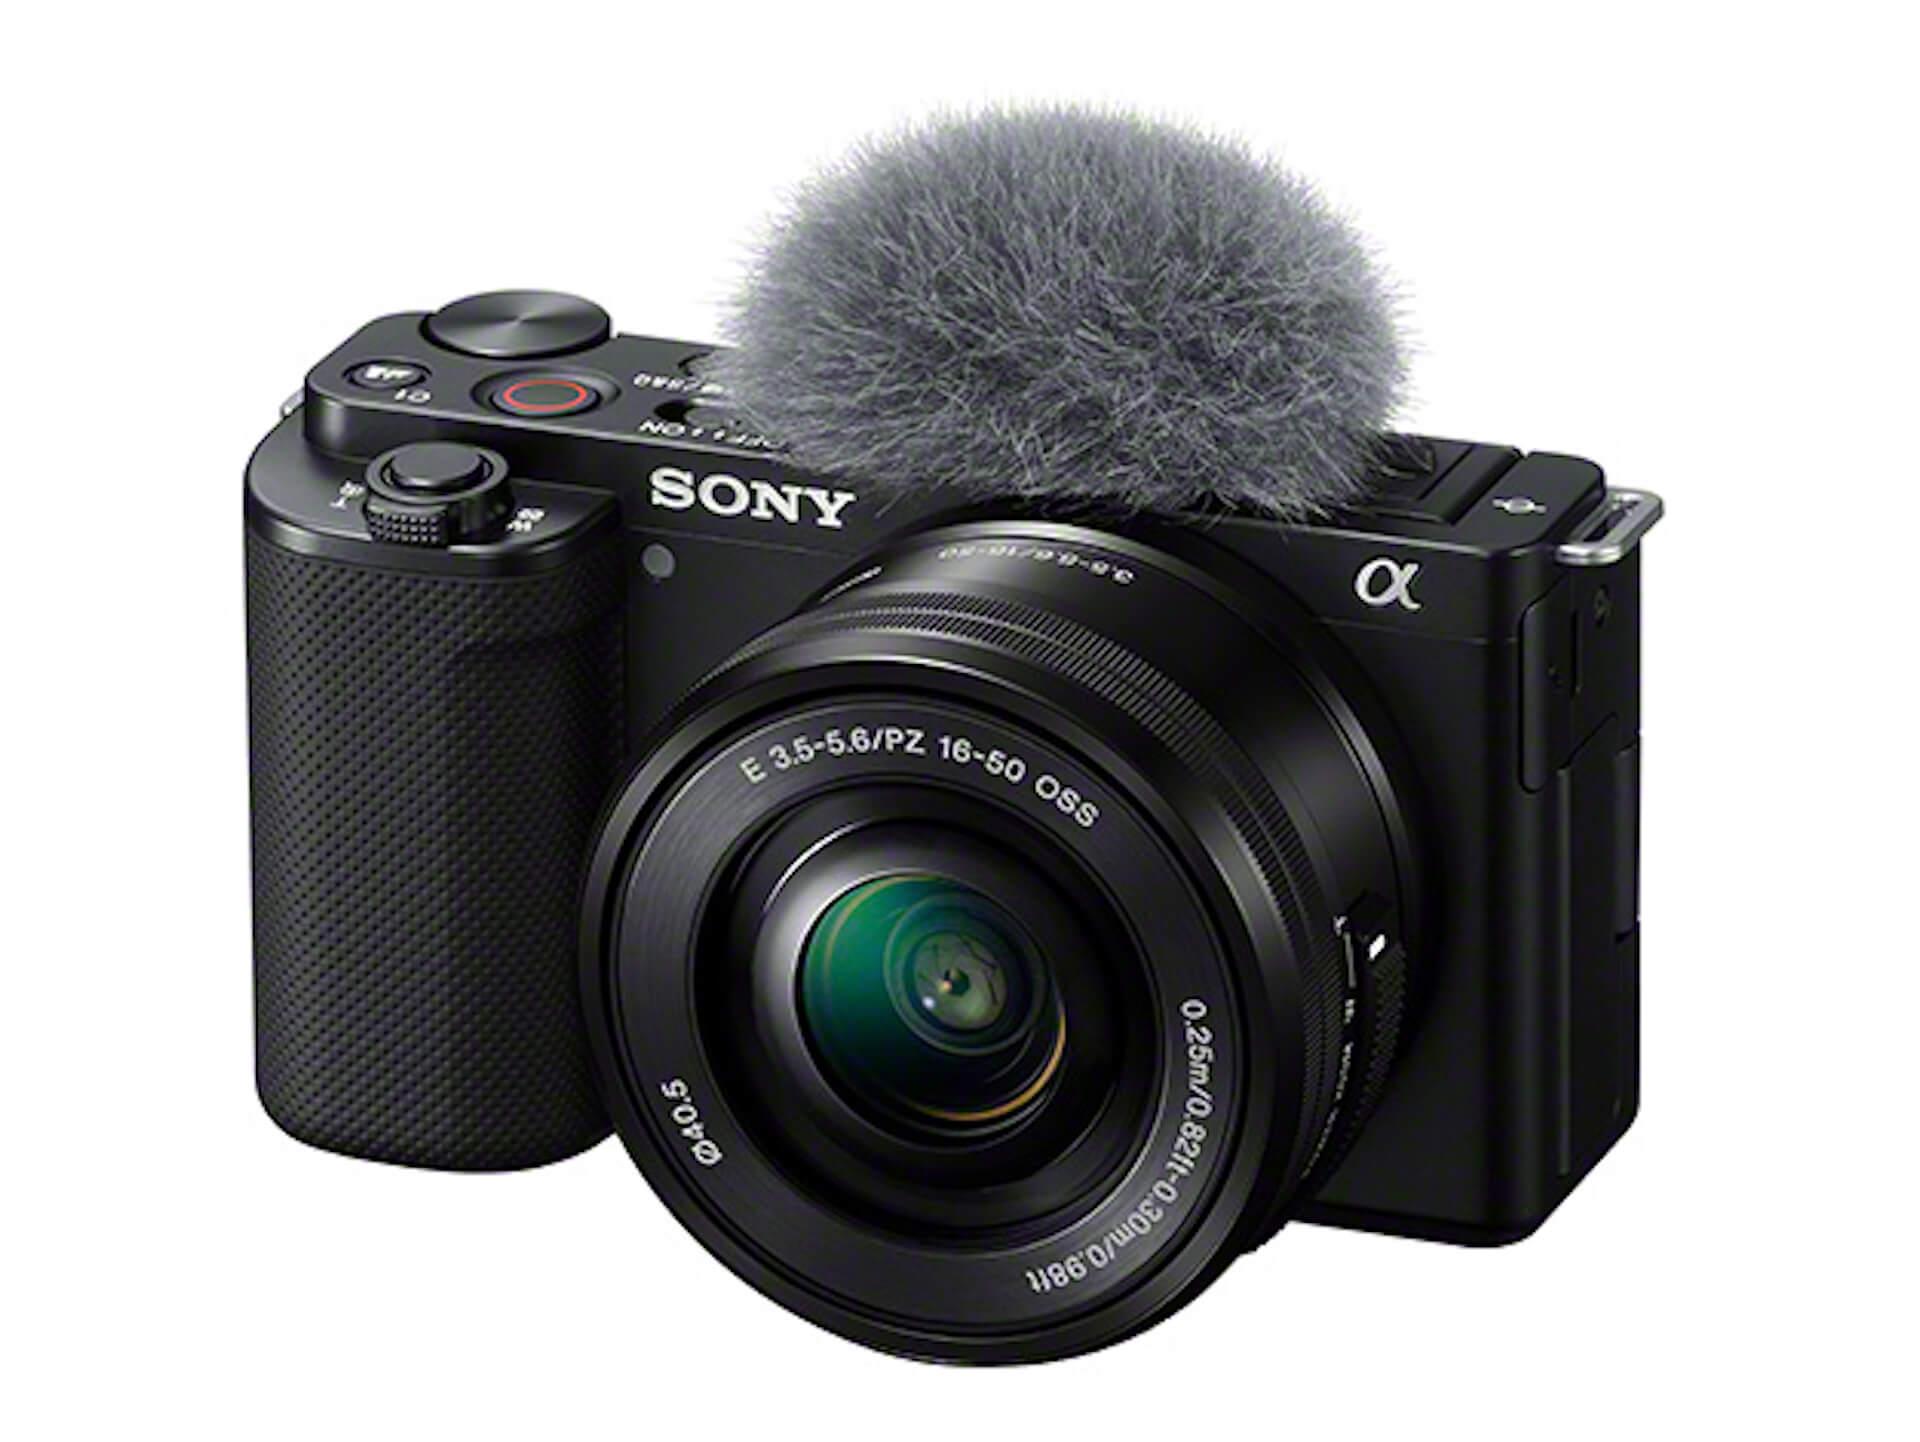 SONYからVlog撮影に特化したαTMシリーズ初のレンズ交換式カメラ「VLOGCAMTM ZV-E10」が発売! tech_210729_sonyvlogcam5